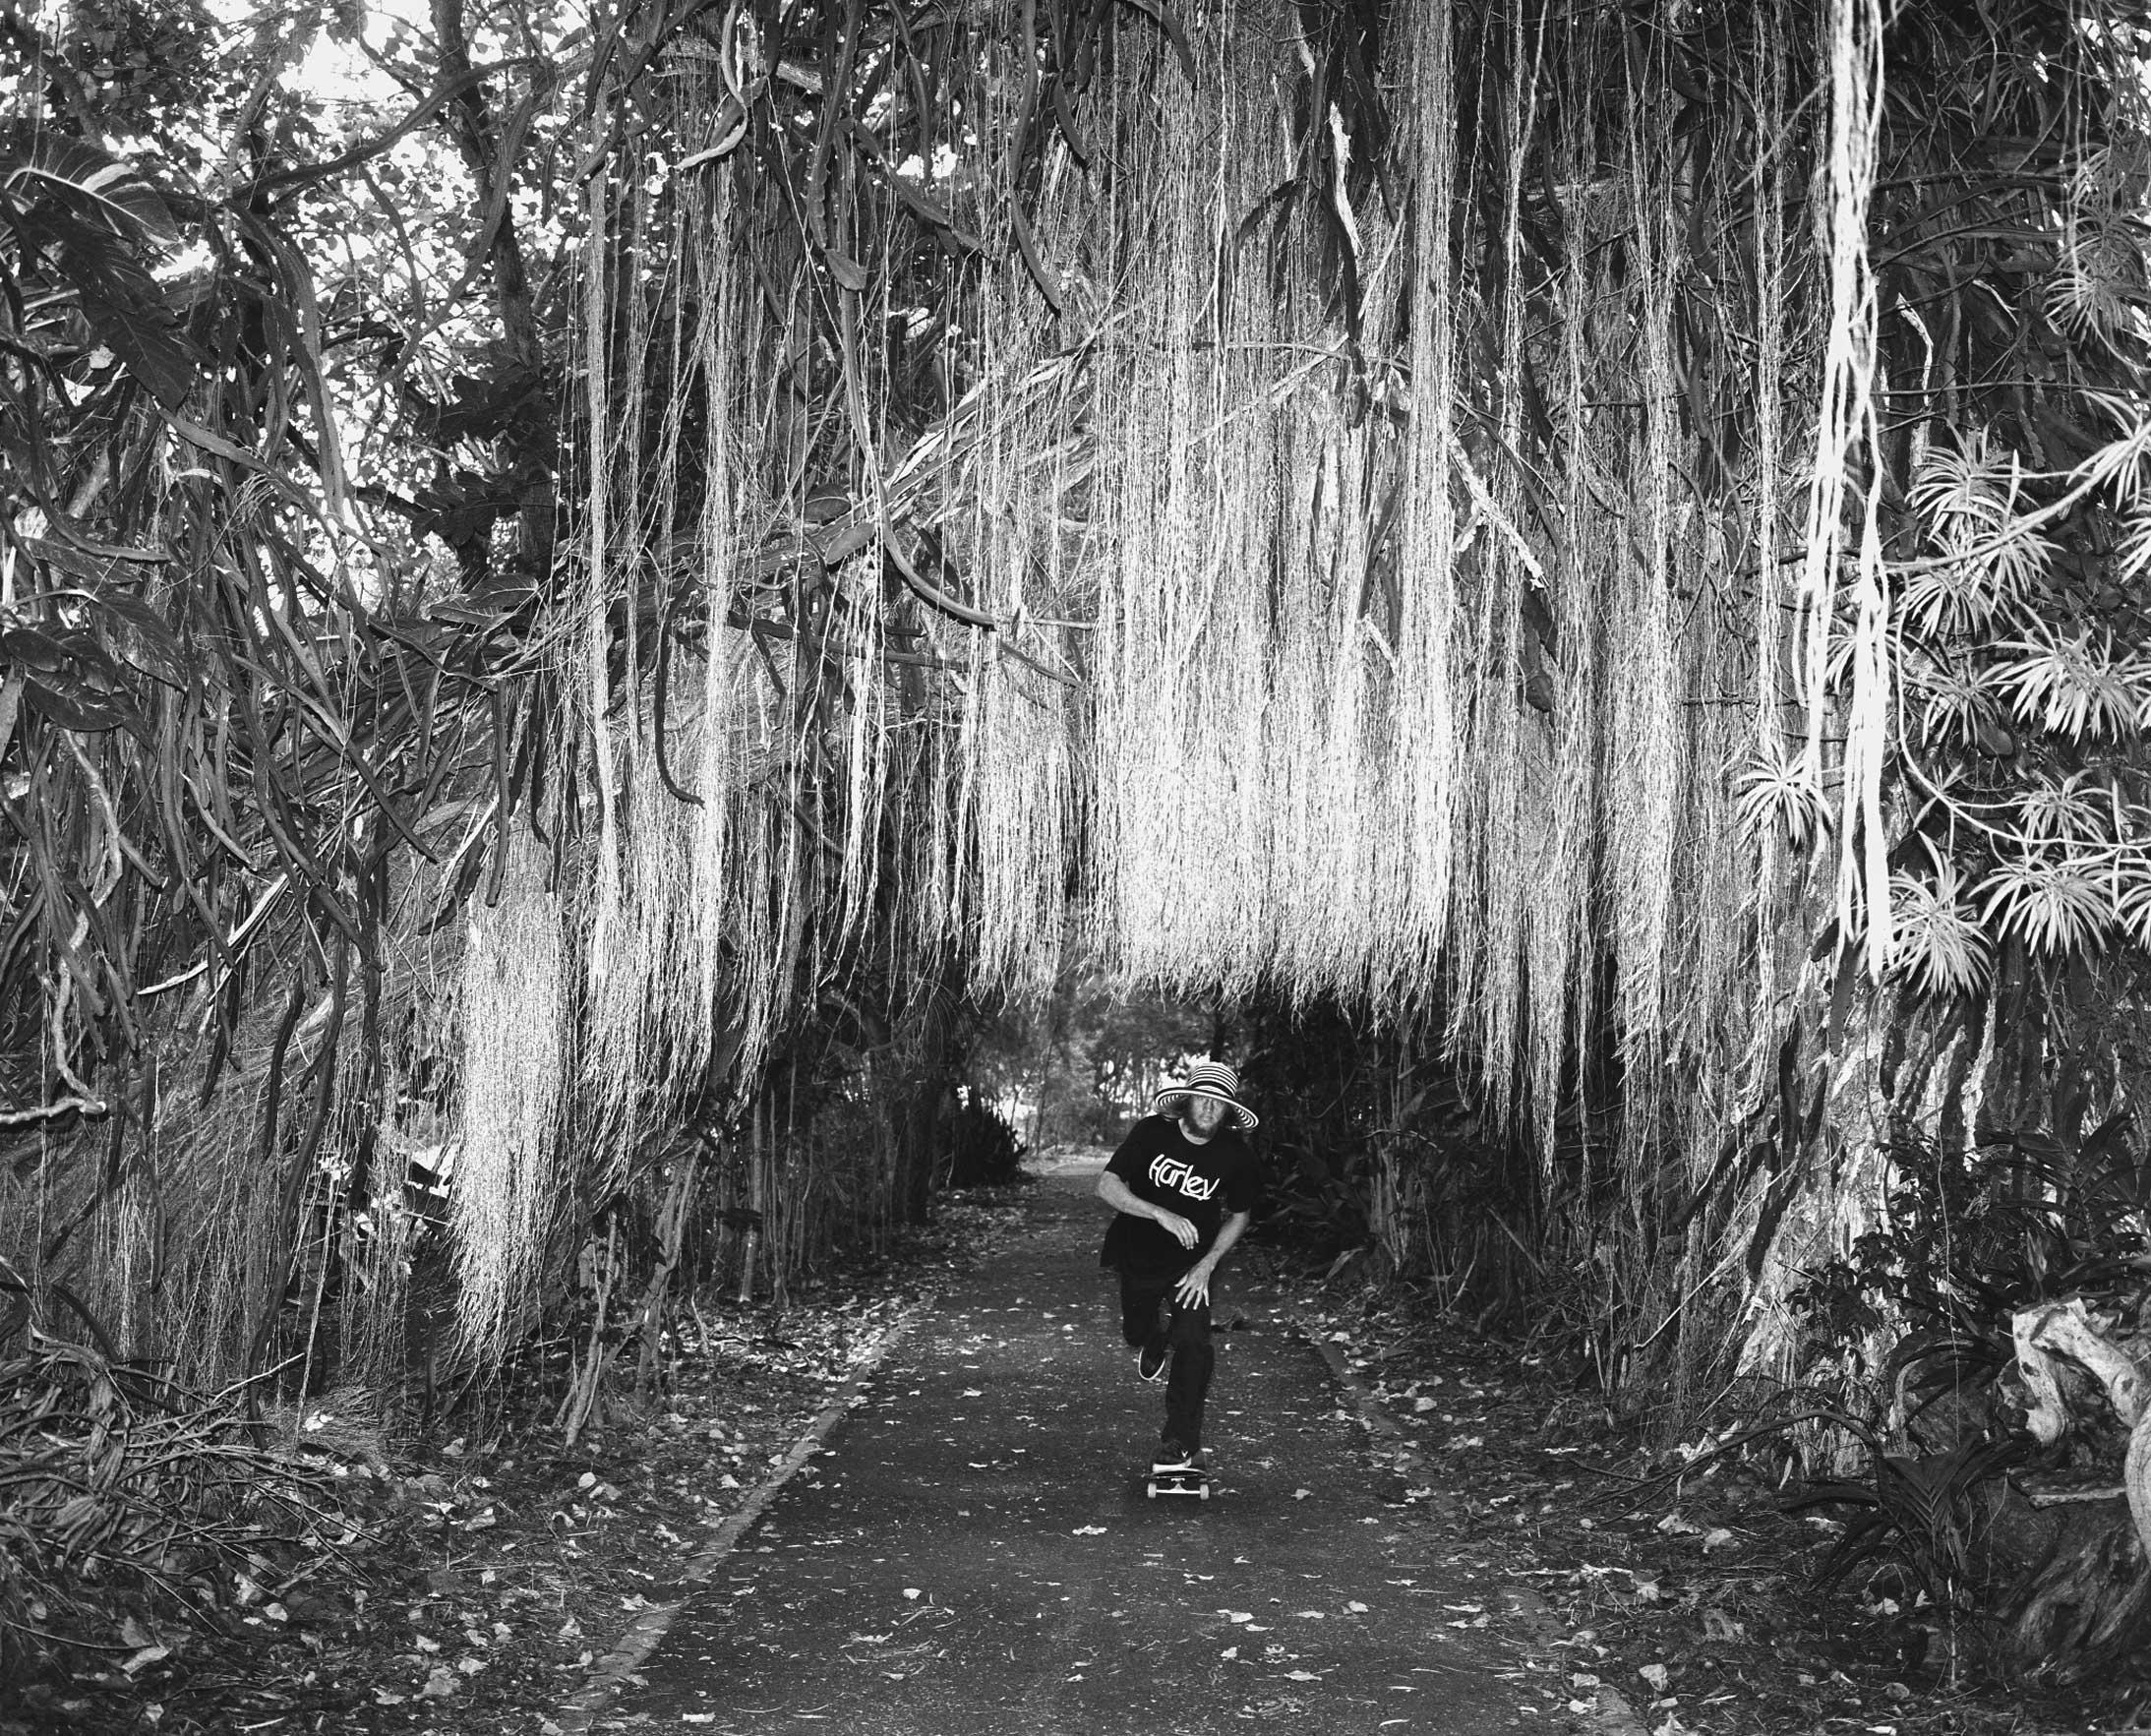 Greyson Fletcher skates on 'the path' at Oahu's North Shore, Hawaii.